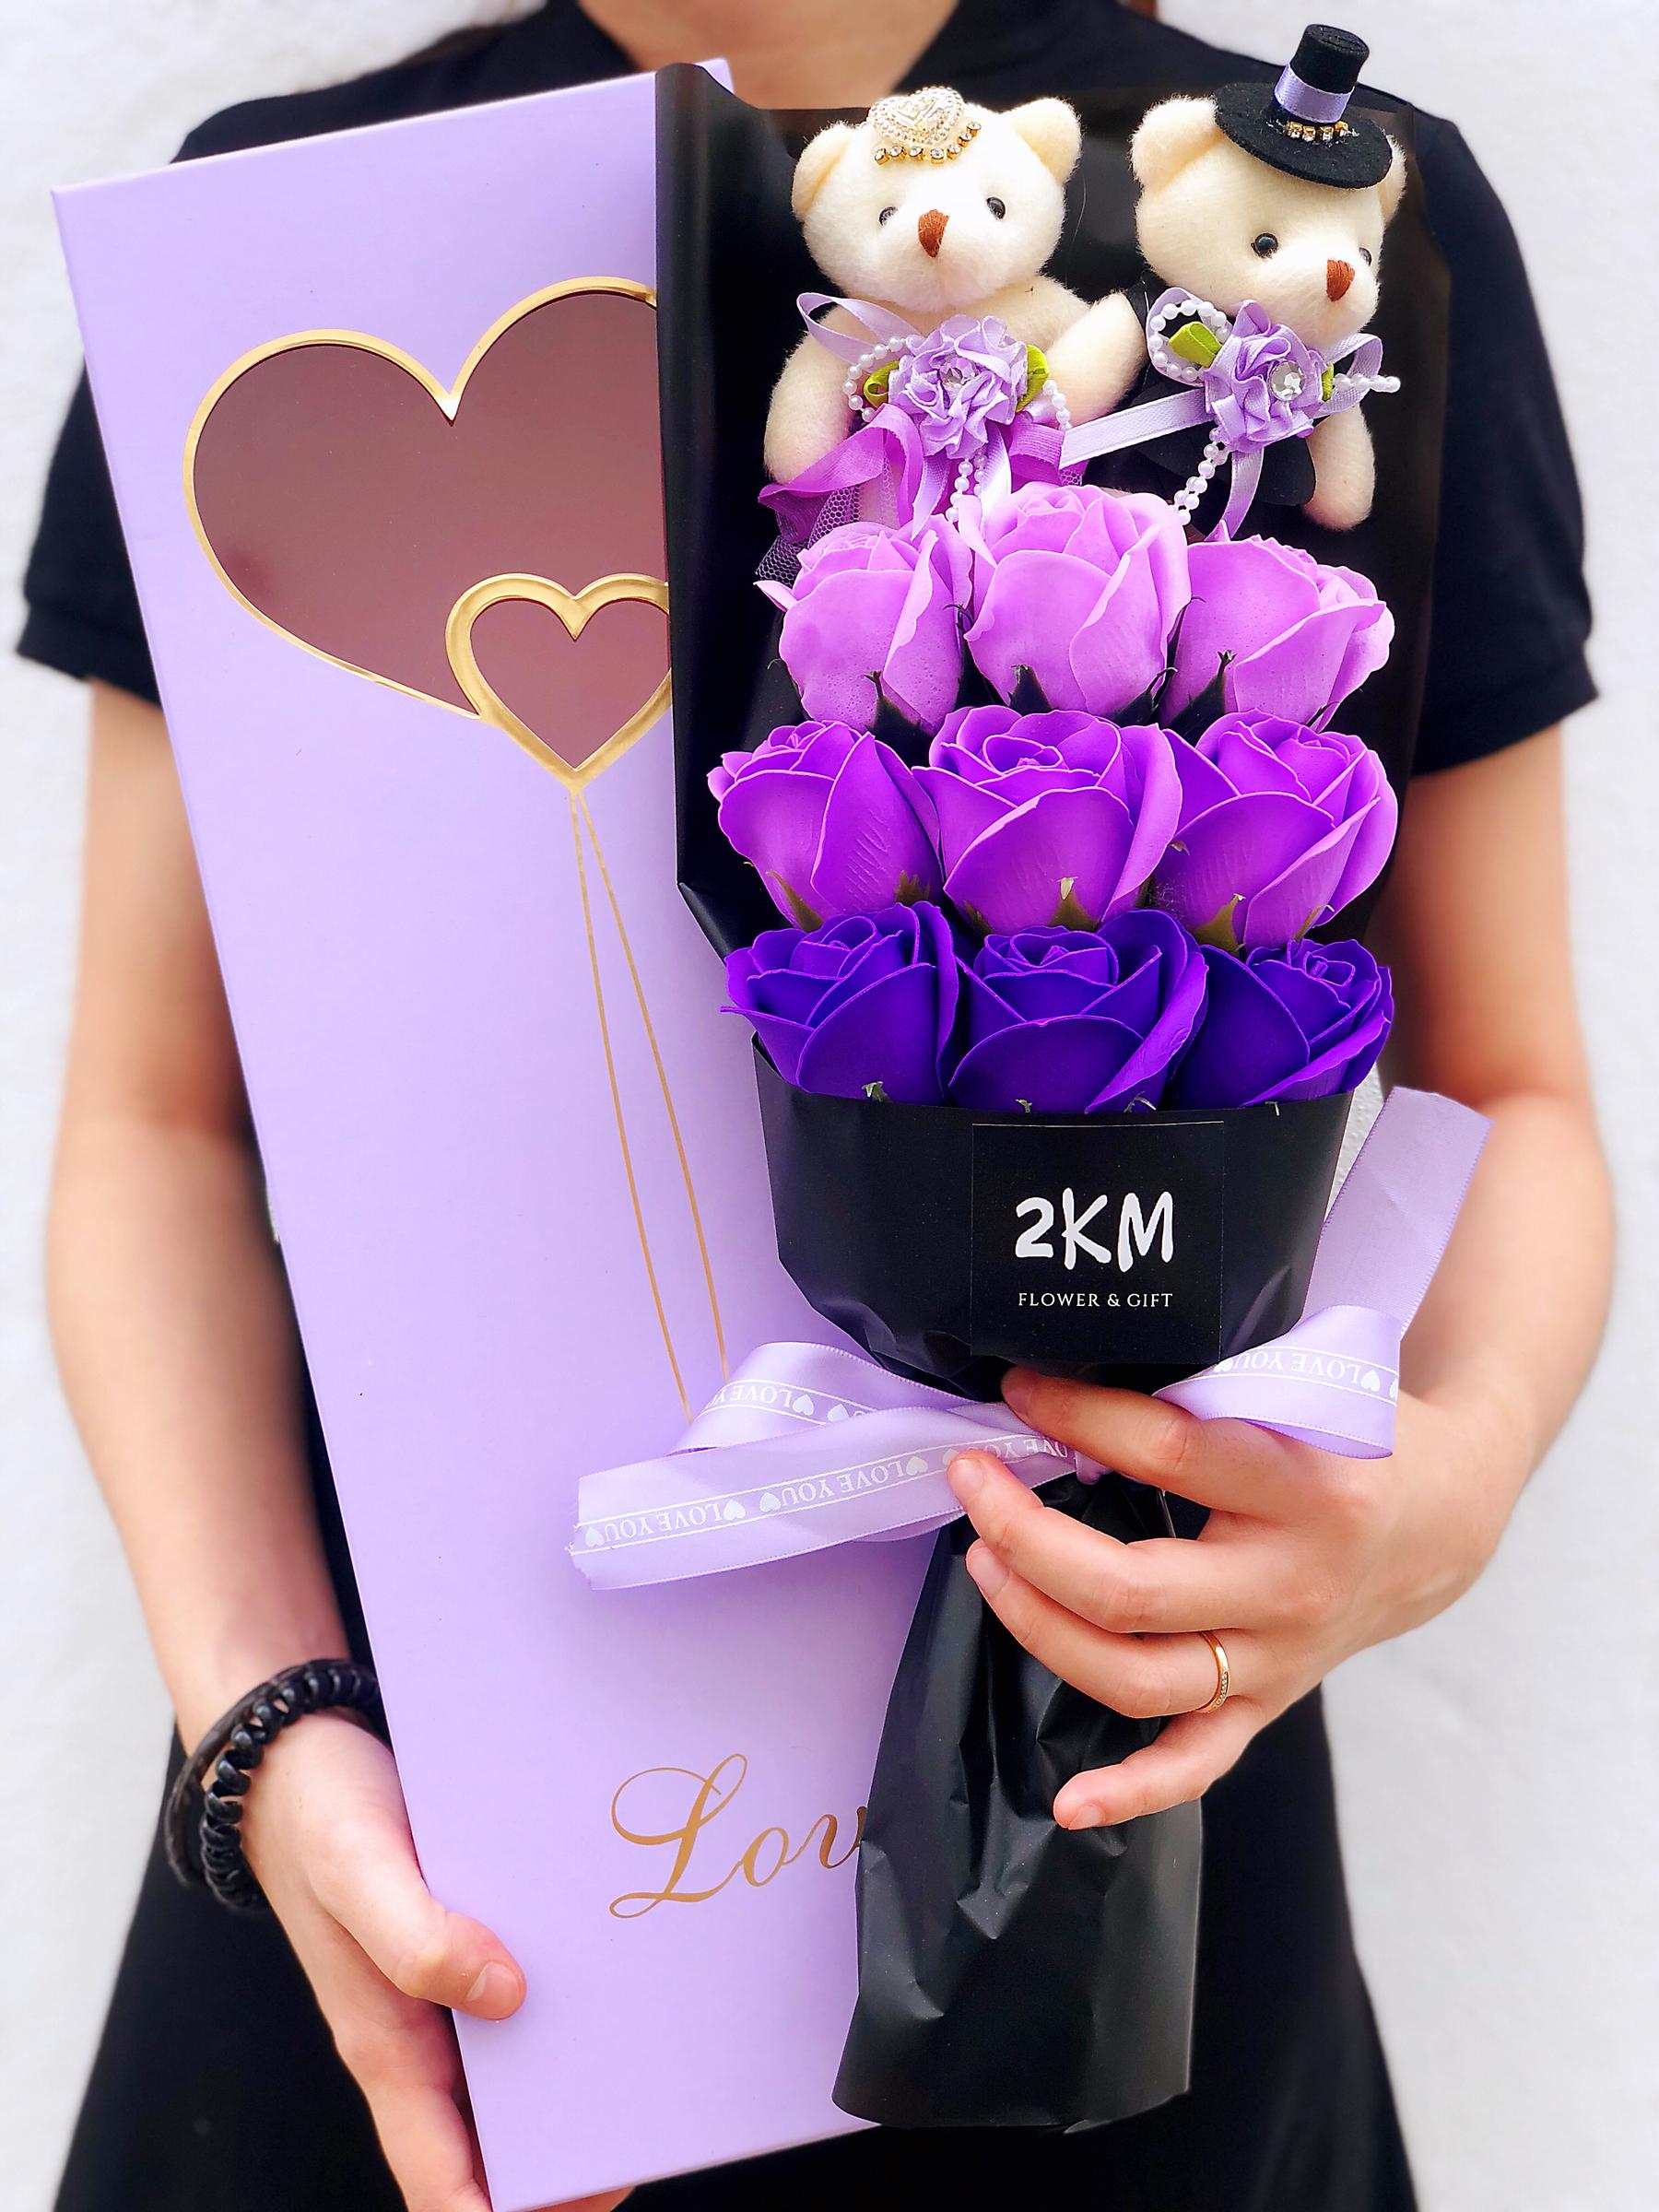 9pcs Rose Teddy Soap Flower